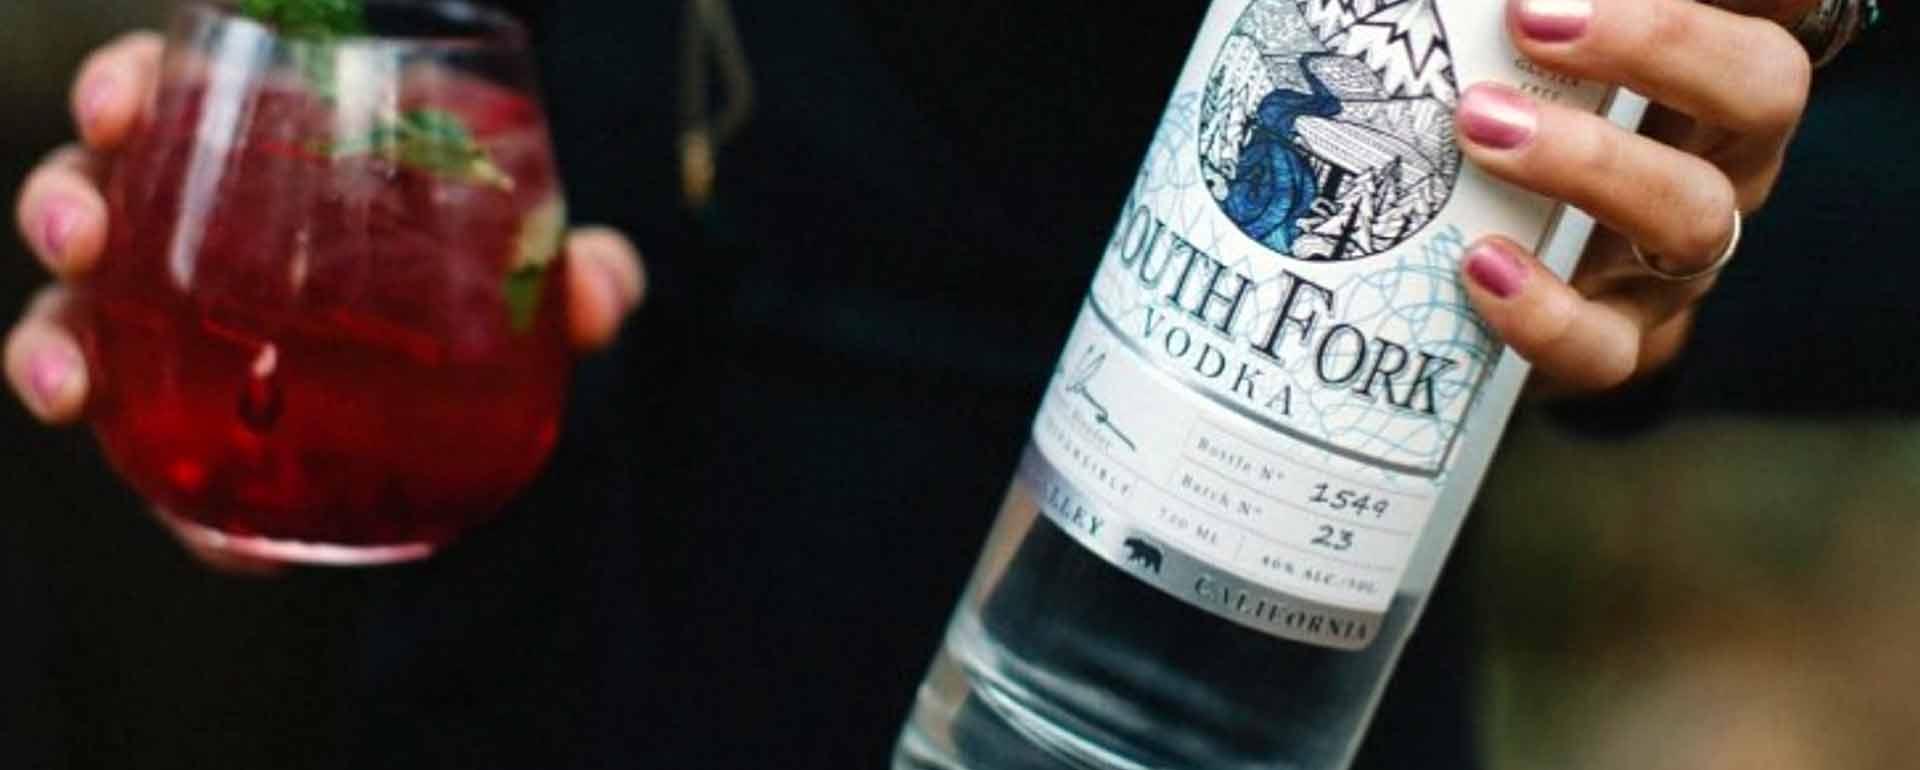 Spirit Labels - Custom Spirit Bottle Labels, Labels for Spirit Bottles, Liquor Bottle Labels